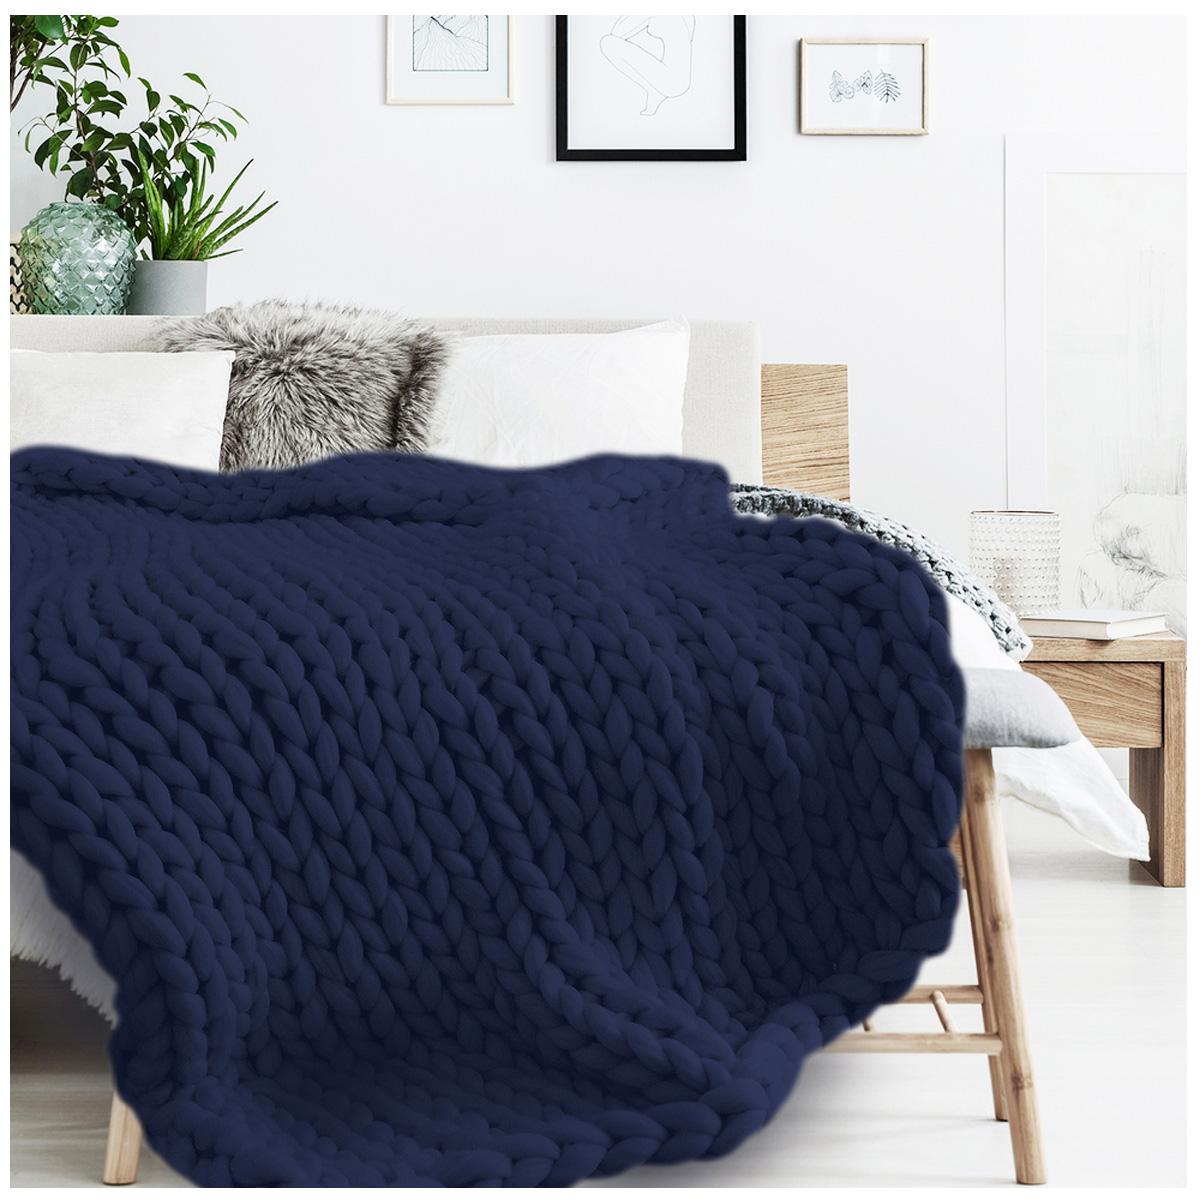 Plaid acrylique \'Chunky Knit\' marine (tricot) - 150x120 cm - [R1074]